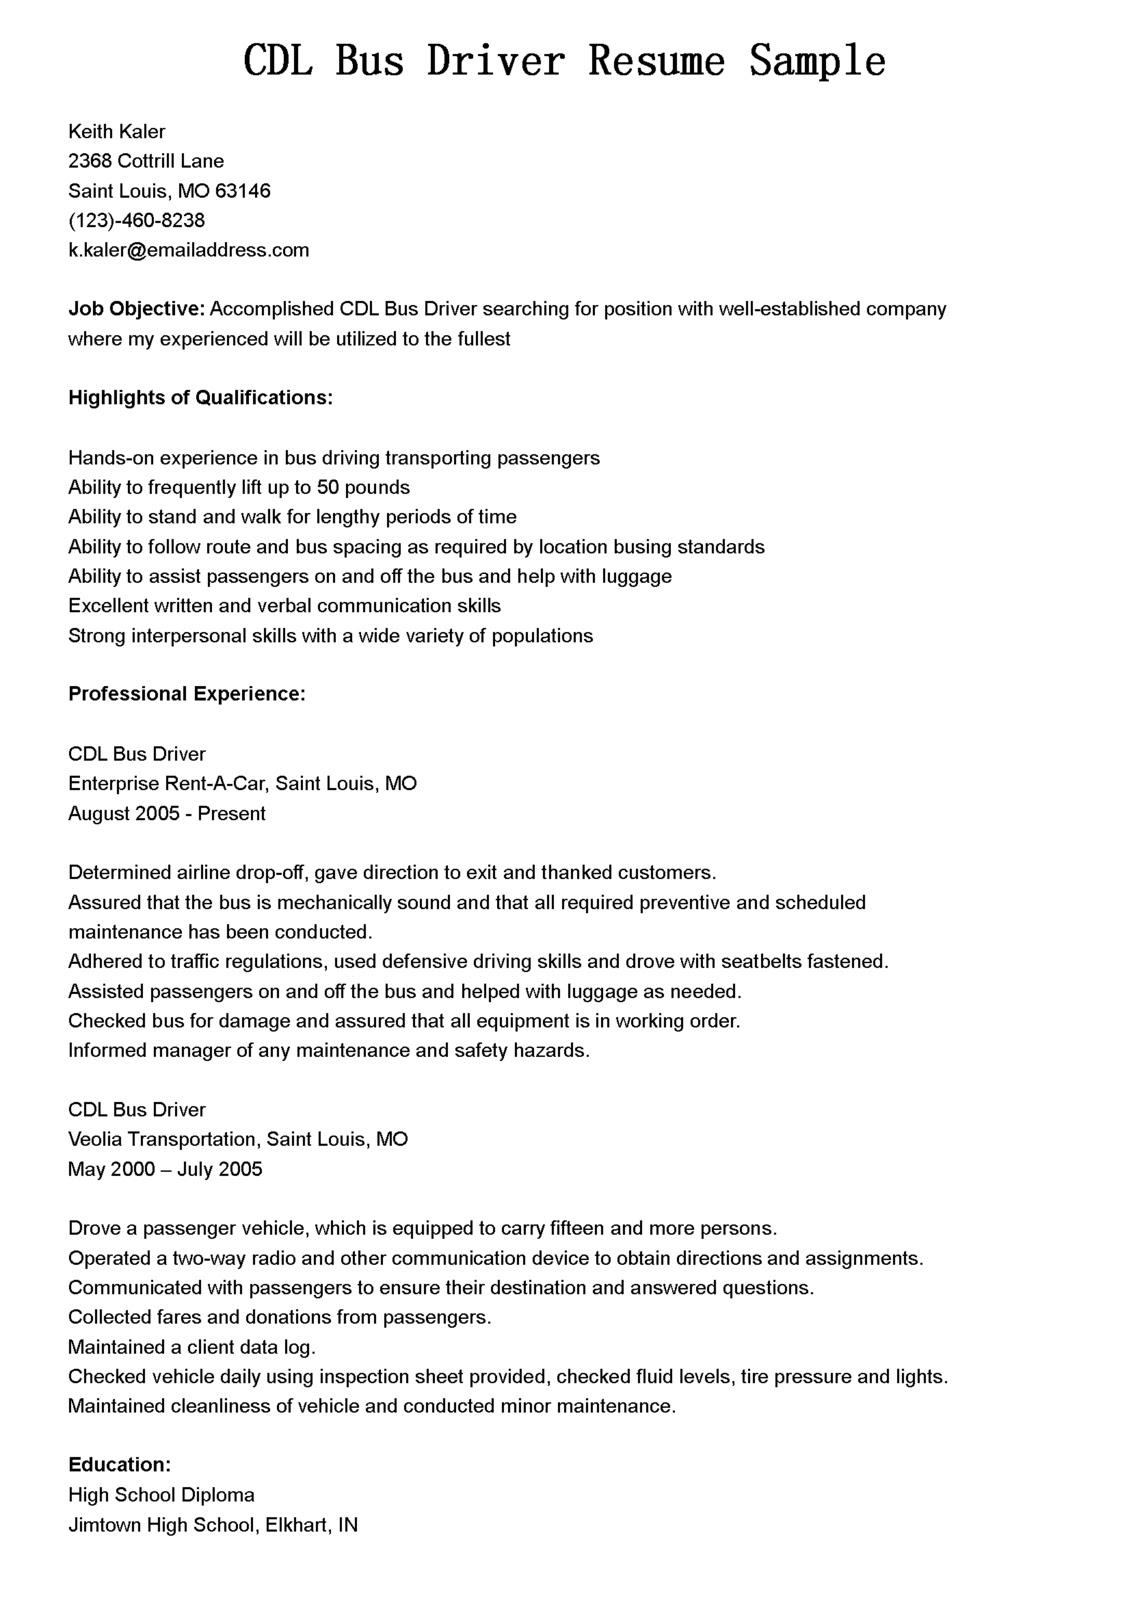 bus driver resume templates Oylekalakaarico